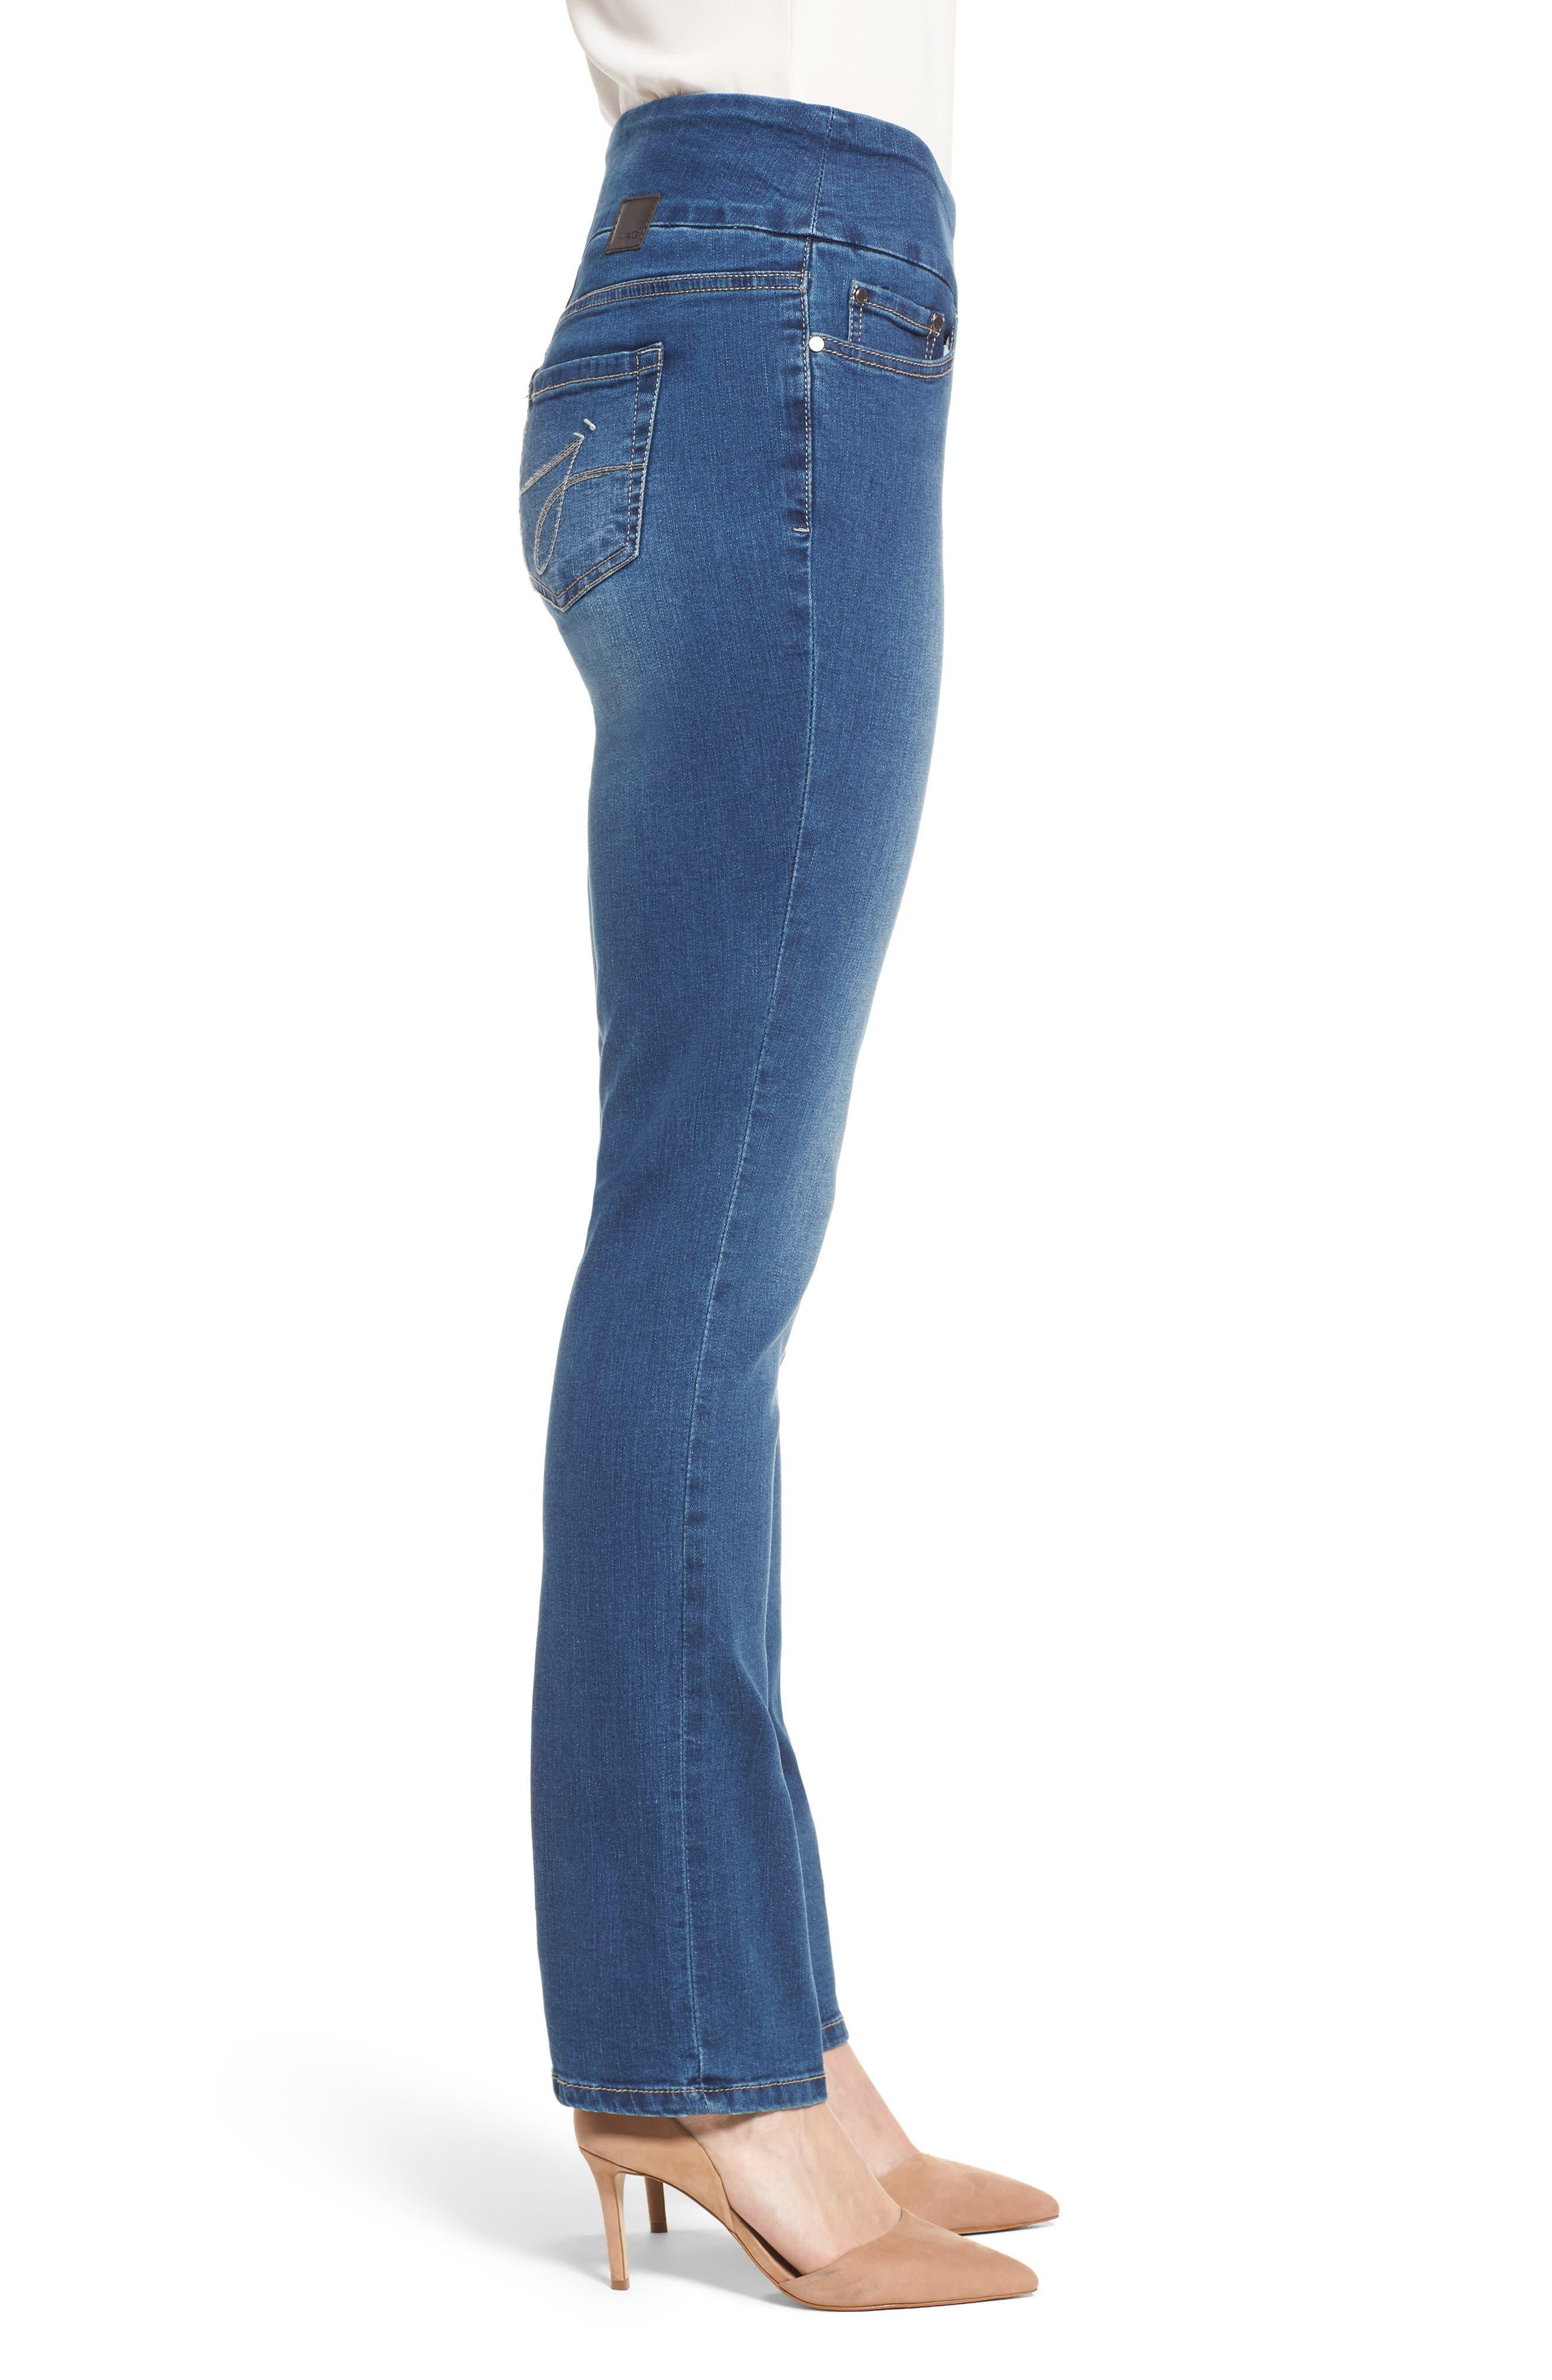 Peri Pull-On Straight Leg Jeans,                             Alternate thumbnail 3, color,                             Medium Indigo